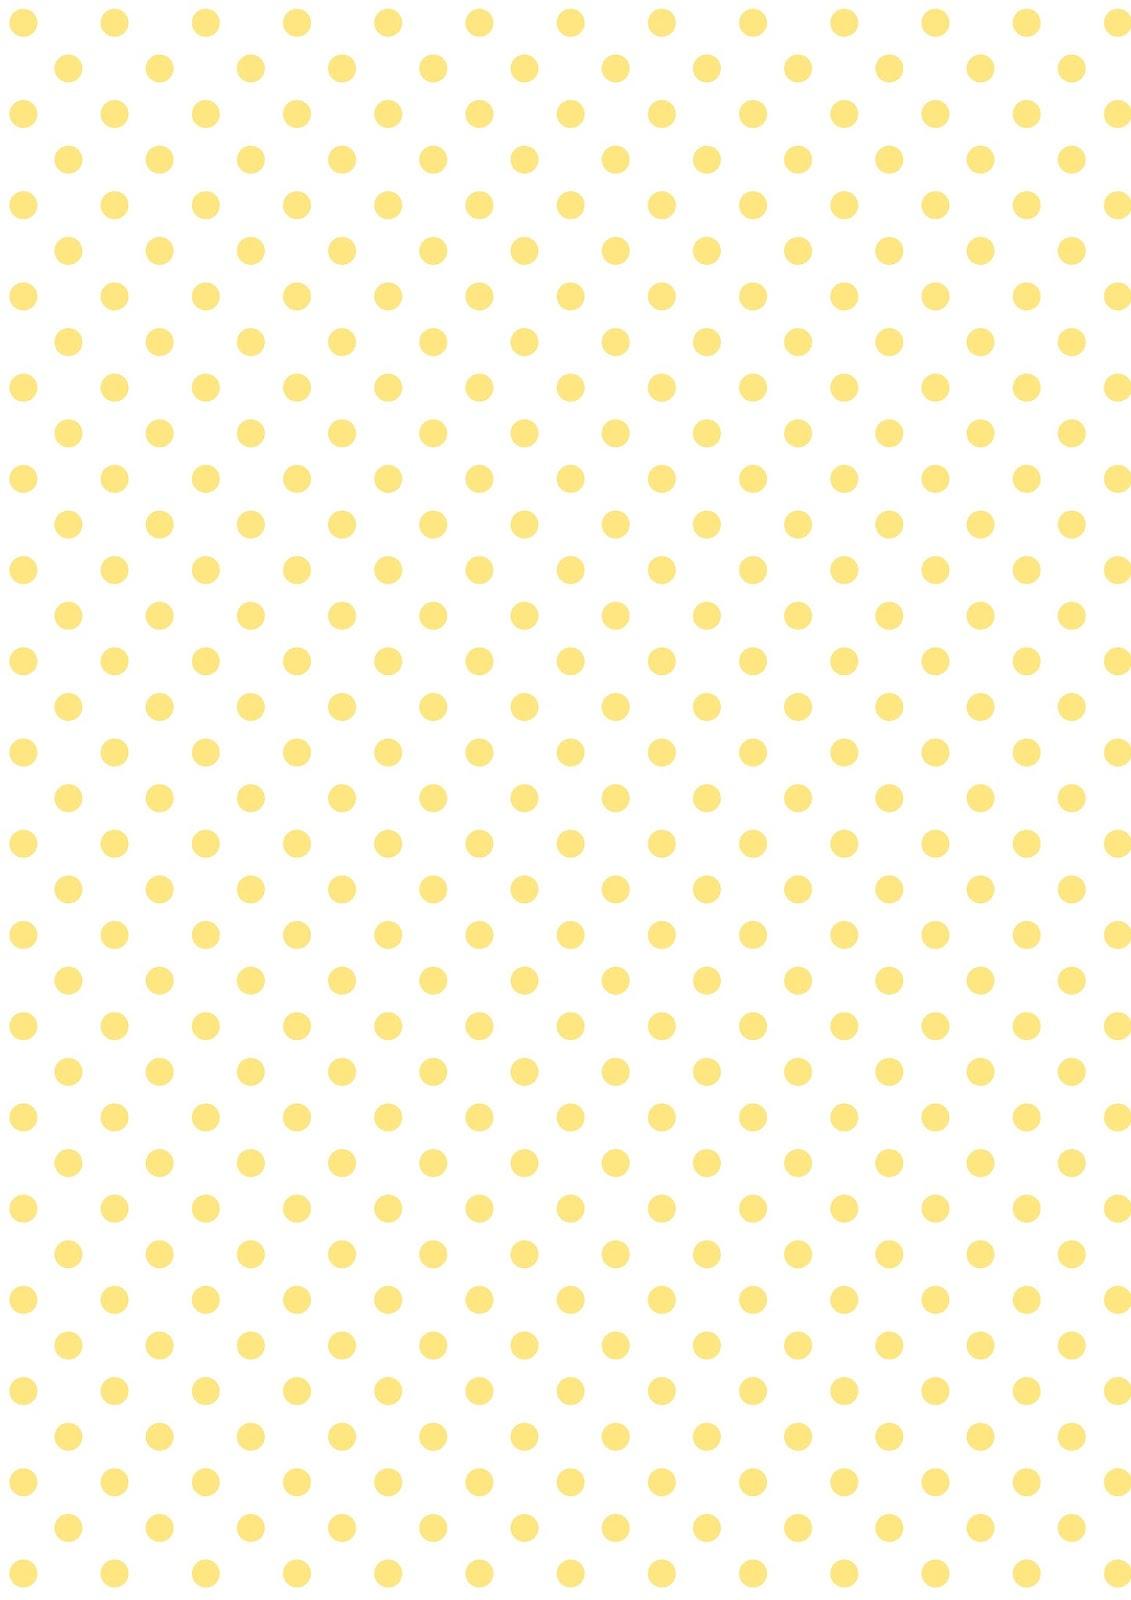 http://2.bp.blogspot.com/-nW1YVW-wAR8/U1-eDjXQ7VI/AAAAAAAAeHg/lQOJFW4PpZ0/s1600/polka_dot_paper_yellow_A4.jpg